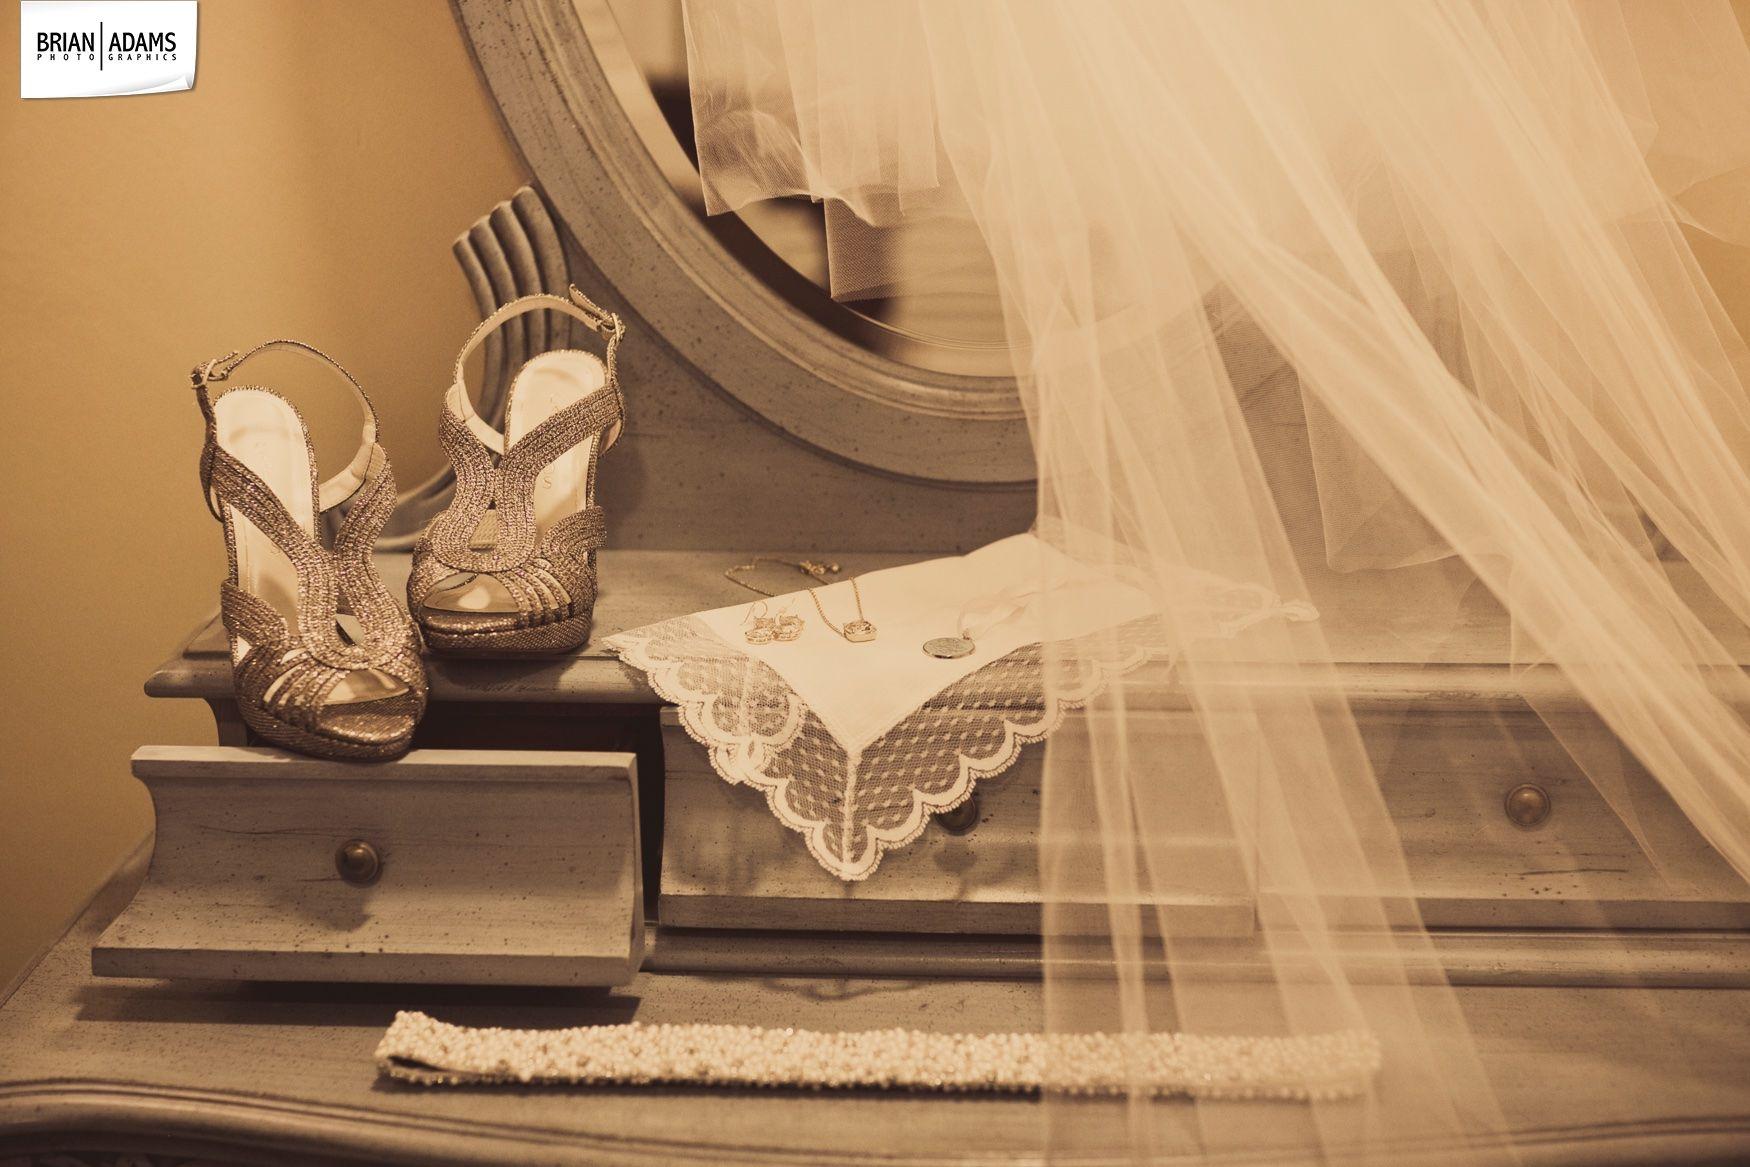 Brian Adams PhotoGraphics | www.brianadamsphoto.com